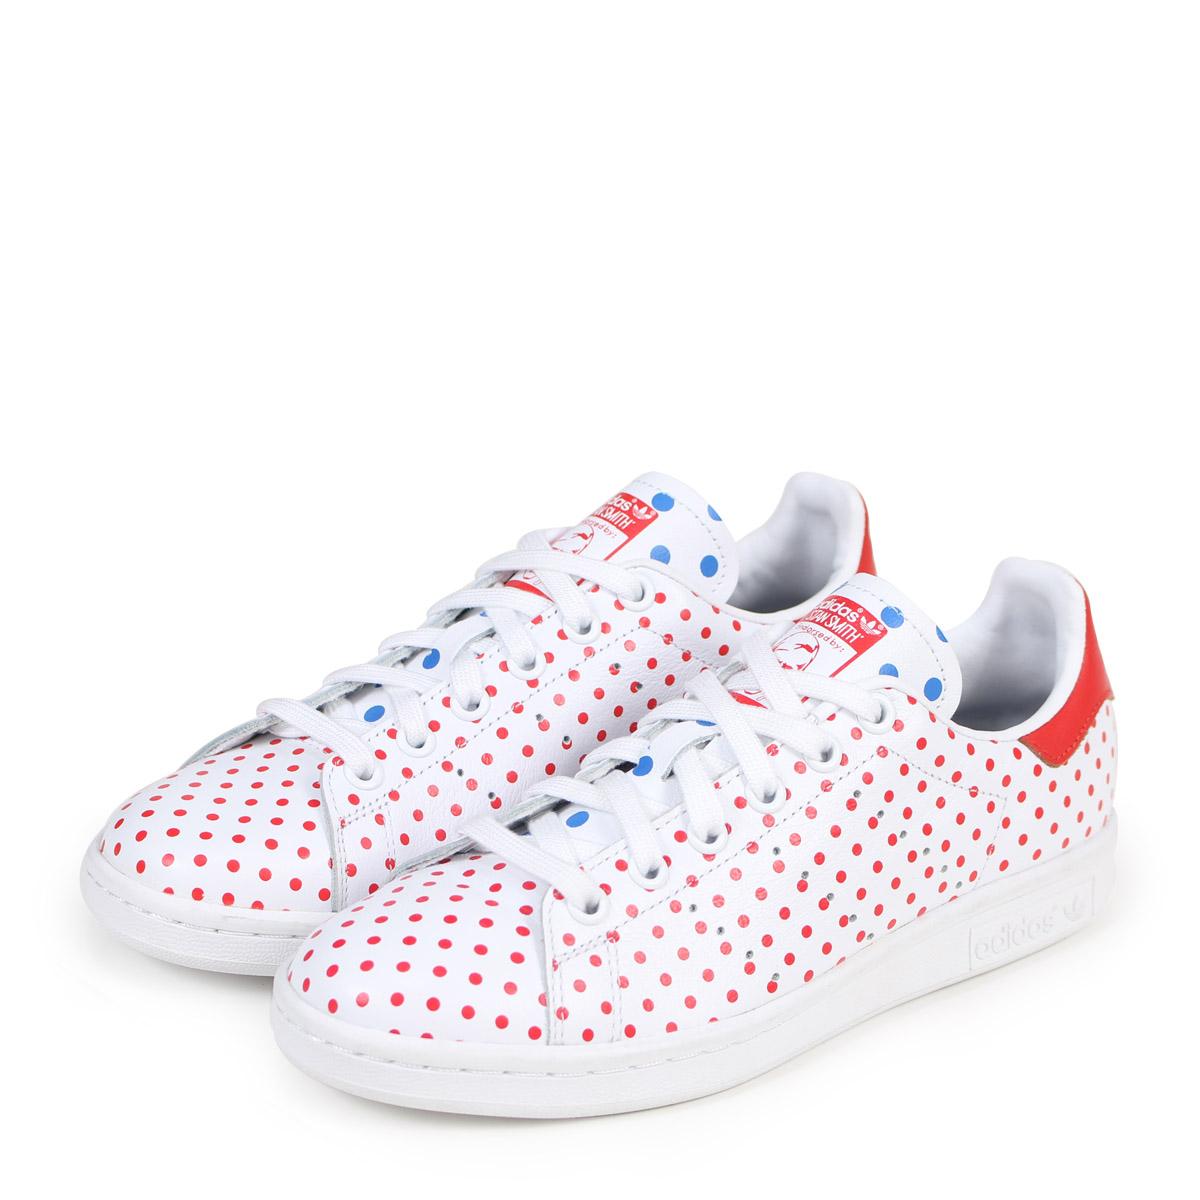 buy popular 77c4c 97a2c adidas Originals PW STAN SMITH SPD Adidas Stan Smith sneakers Farrell  Williams men gap Dis collaboration white originals [load planned Shinnyu  load in ...